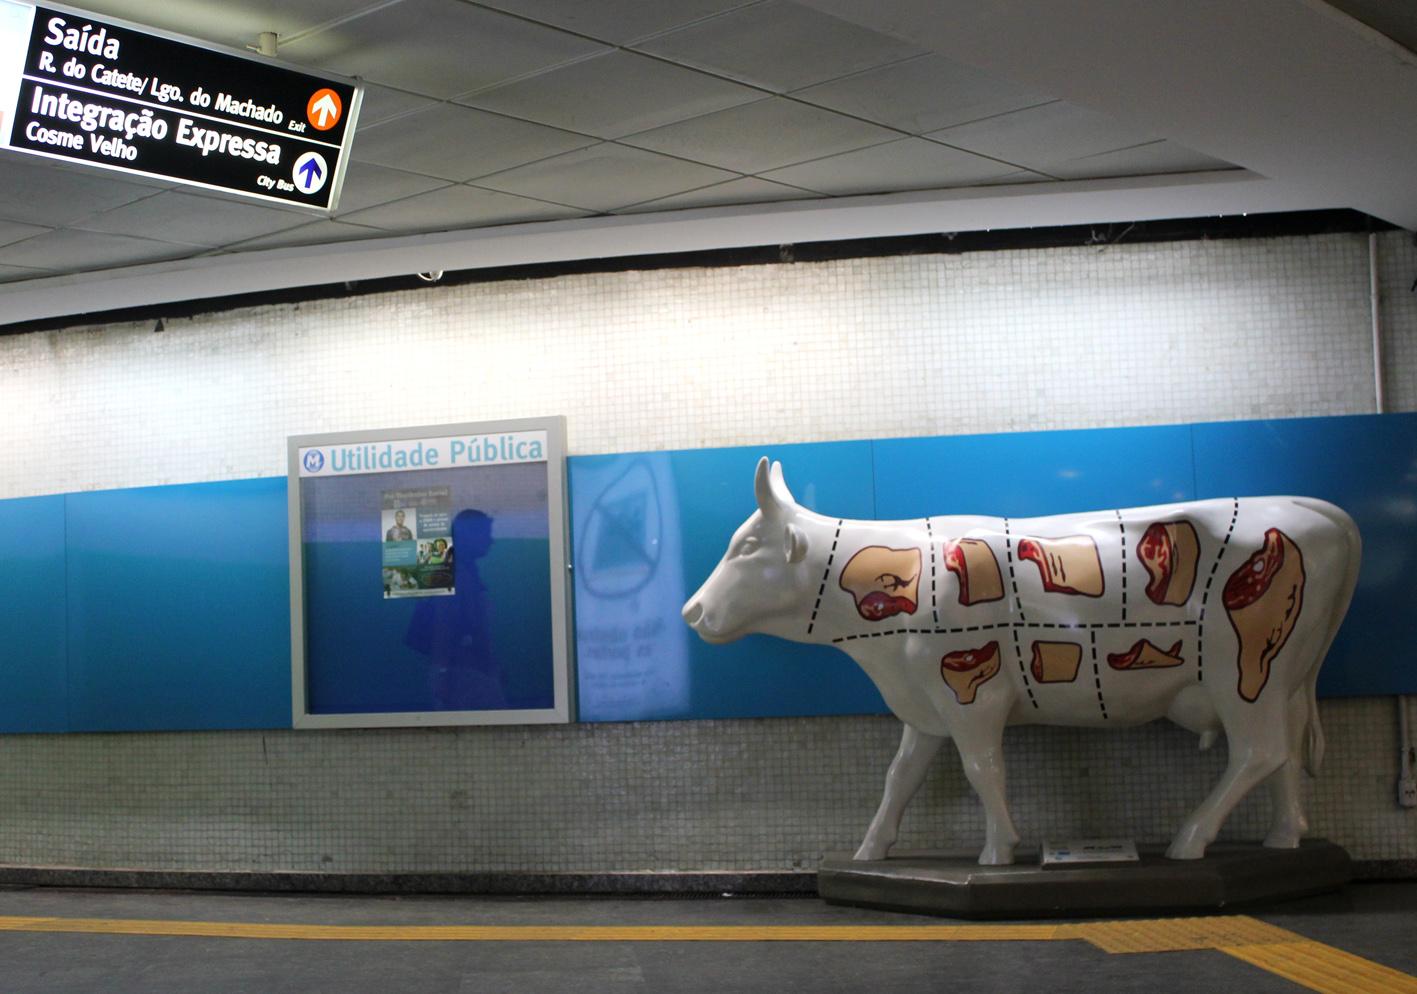 MeatCut_LgoMachado_2_50cm